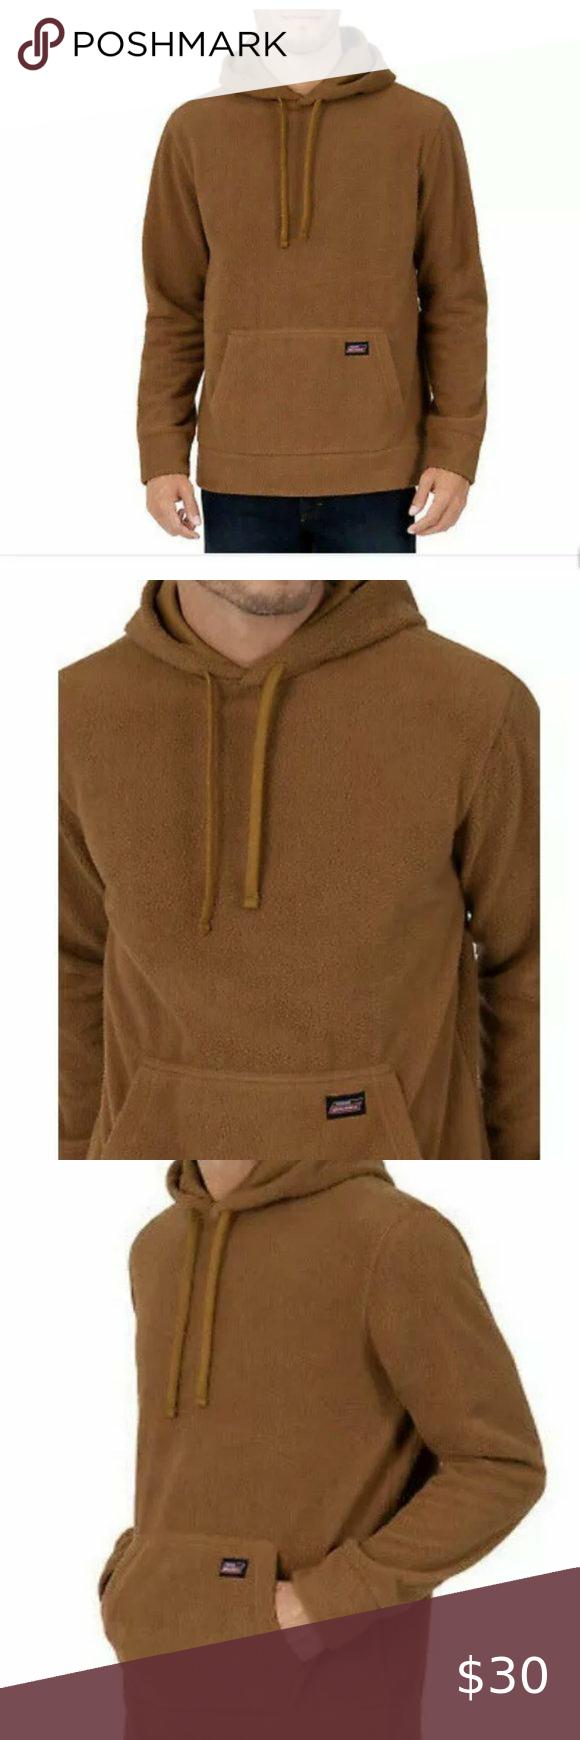 Genuine Dickies Men Faux Sherpa Pullover Hoodie Perfect Sweatshirt As A Gift For Him Or To Keep Cozy For You Bran Hoodies Sherpa Pullover Pullover Hoodie [ 1740 x 580 Pixel ]